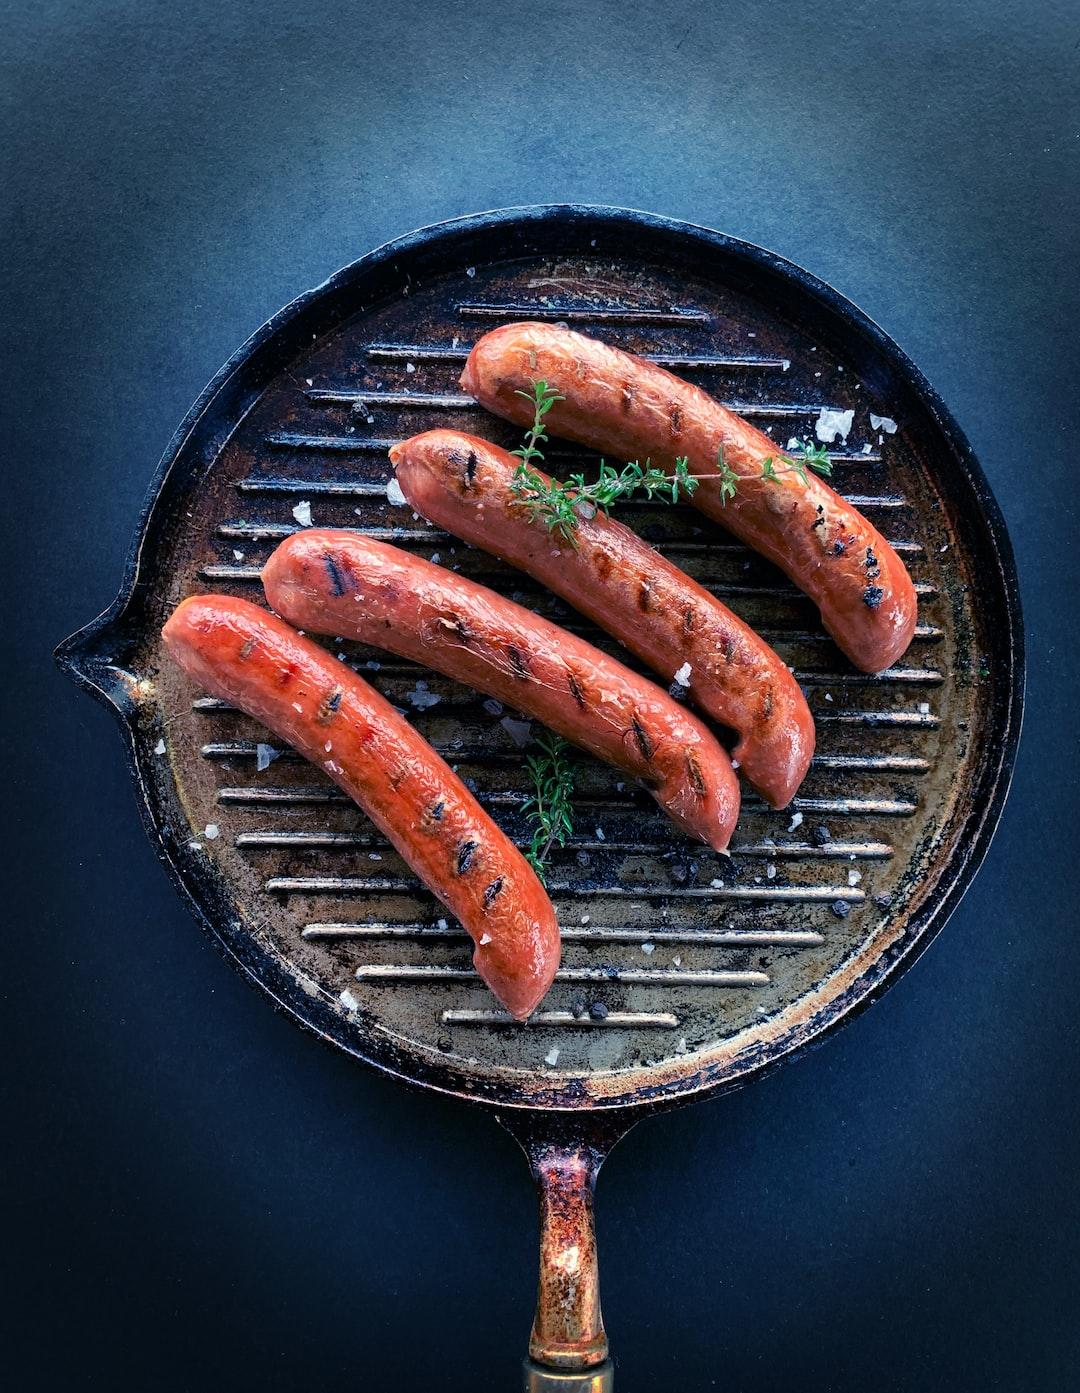 LikeMeat Like Smoked Sausage - Pea based, photographer & cook: Line Tscherning